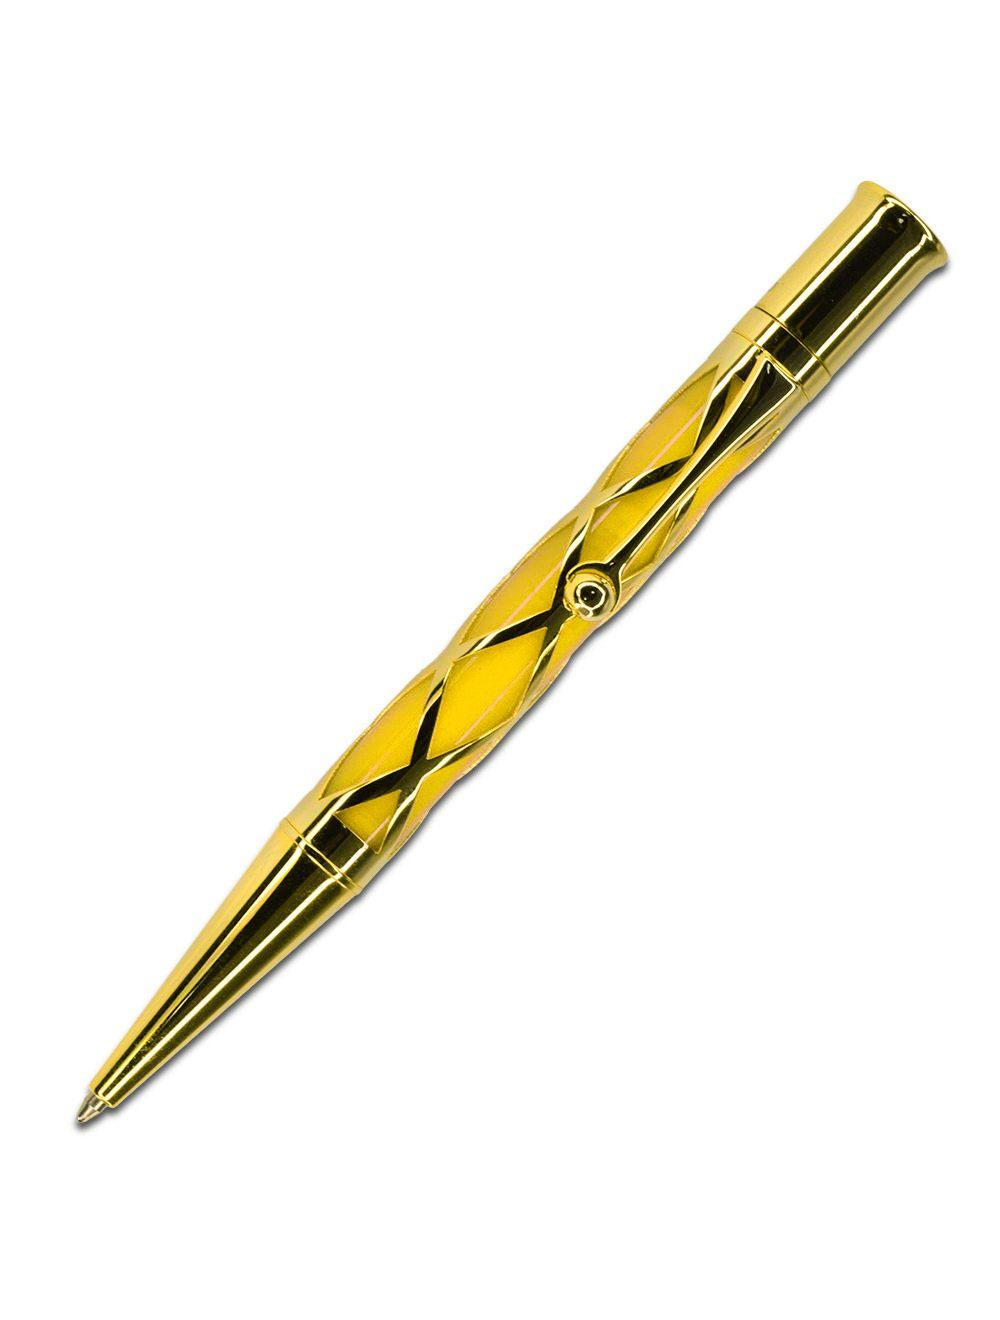 Bohemian Style Ballpoint Pen - Gold Mandarin